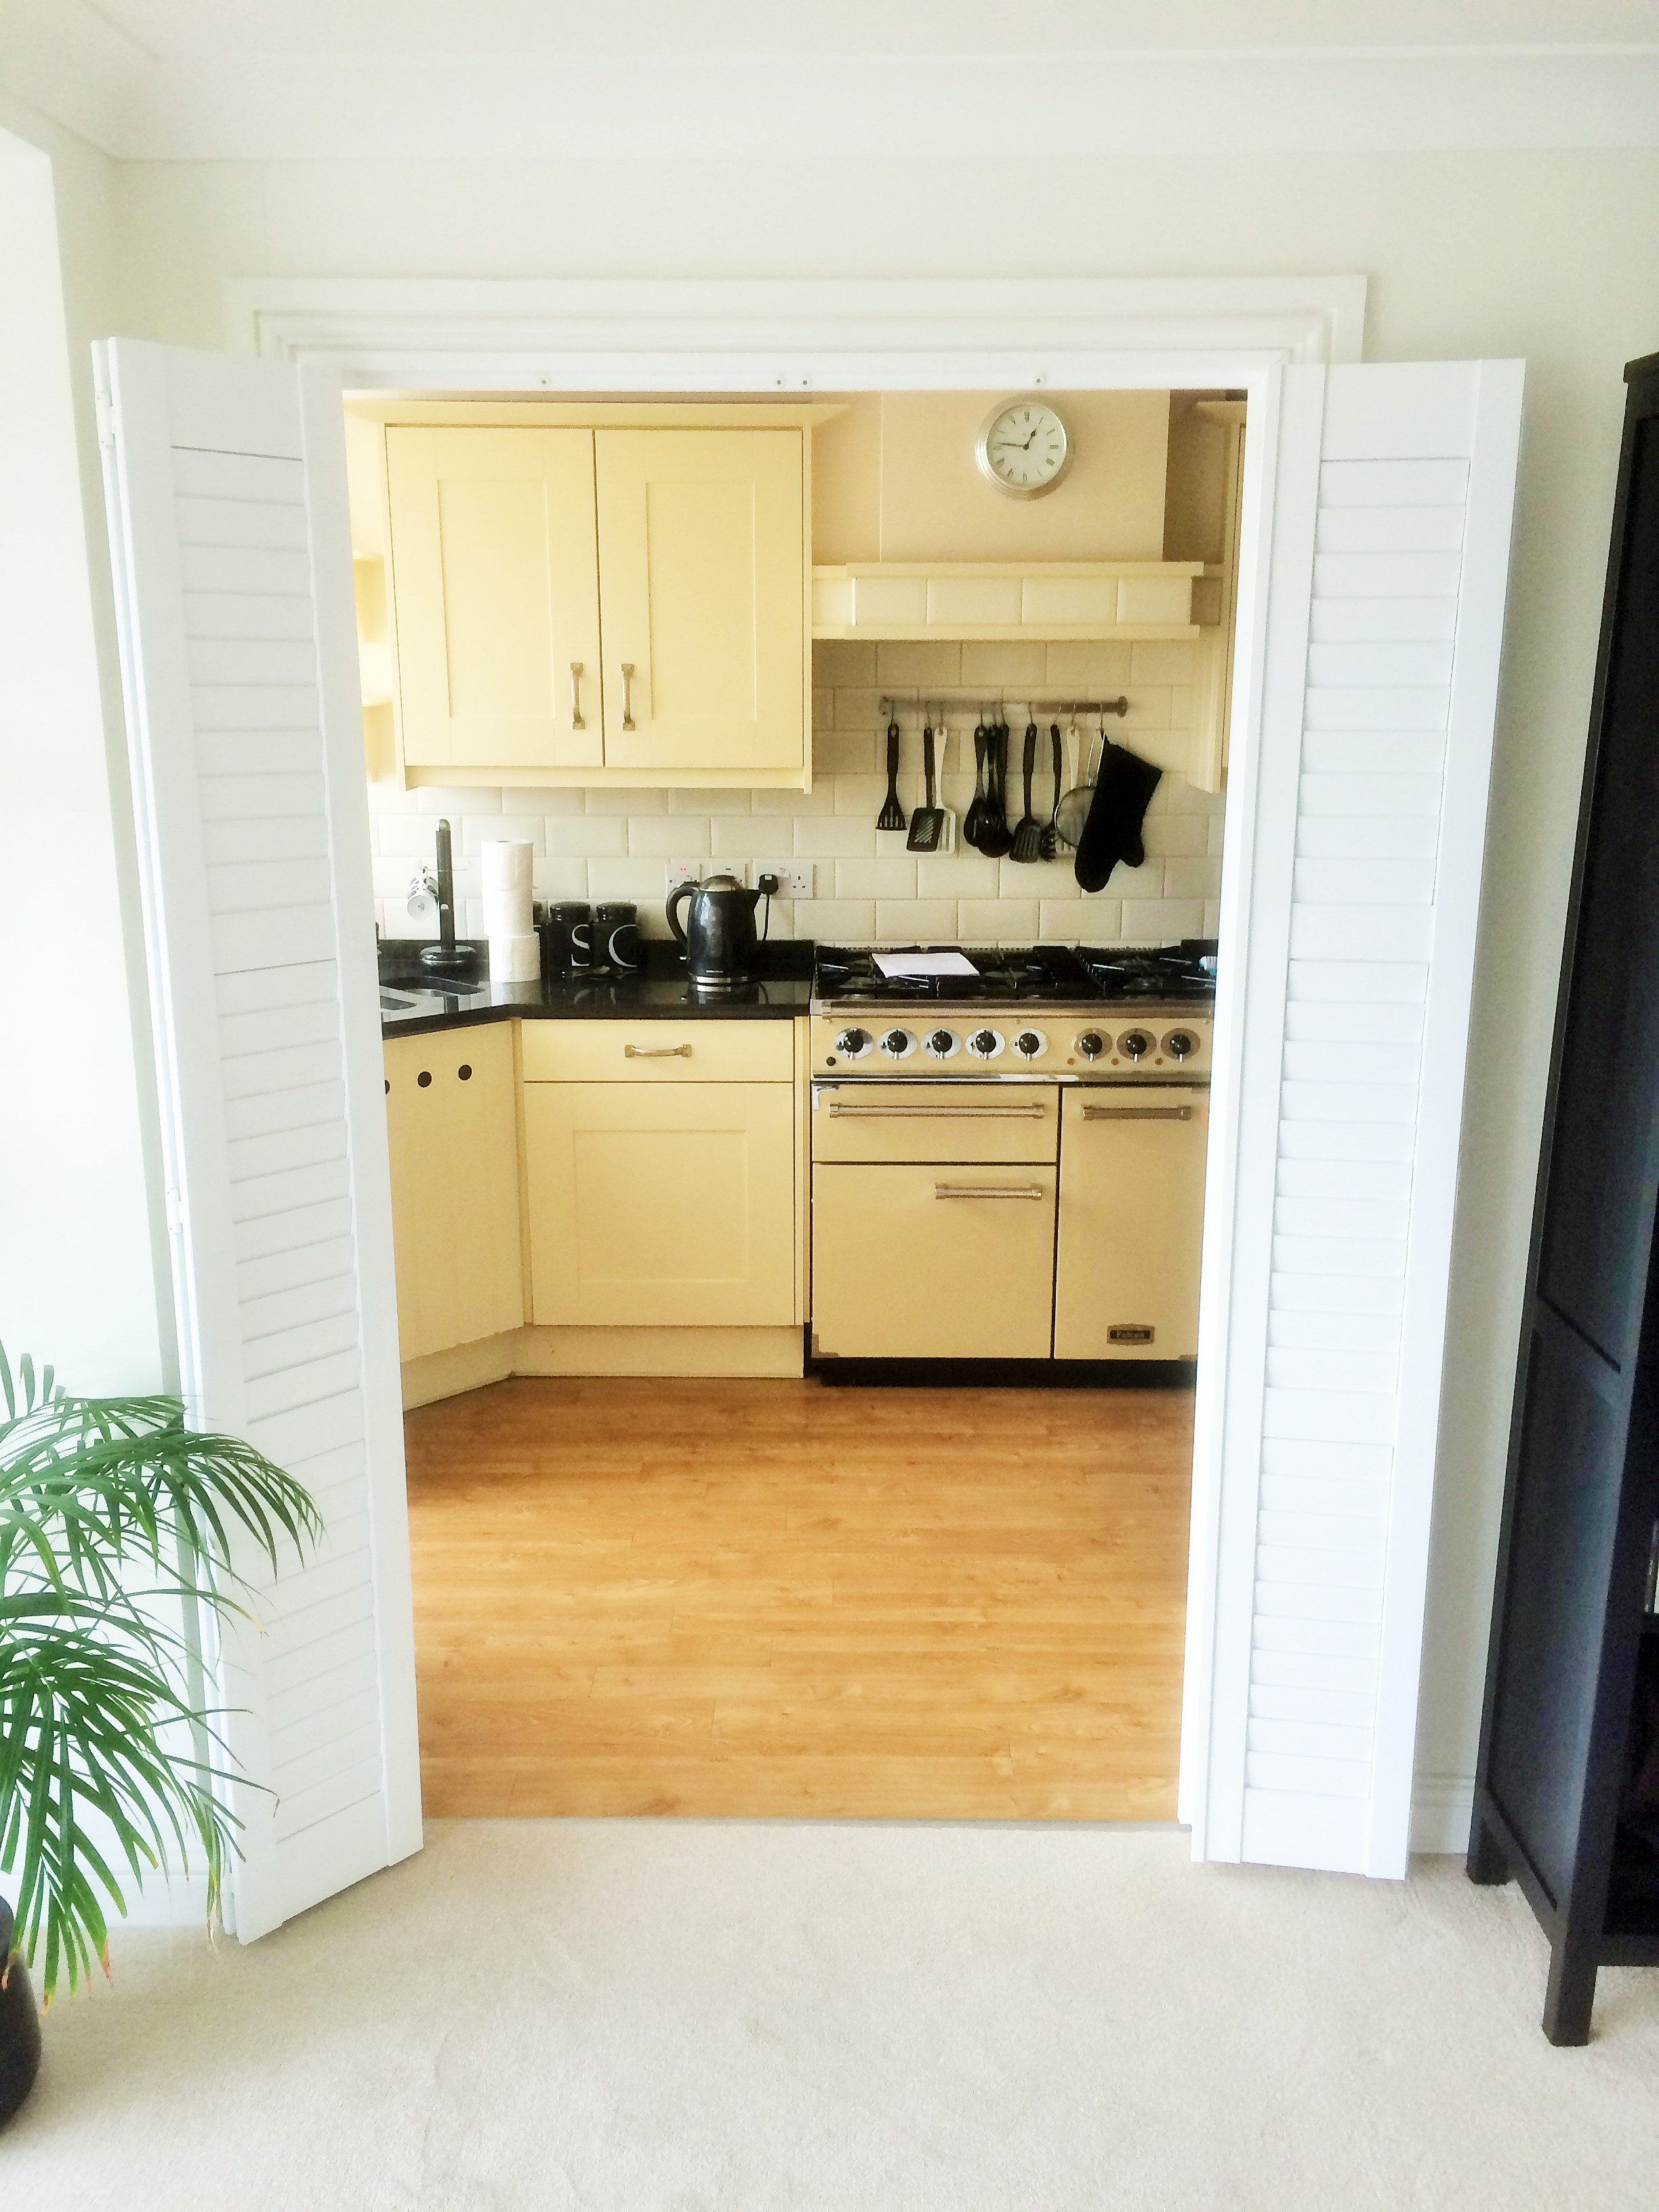 Wooden shutter blinds as room dividers